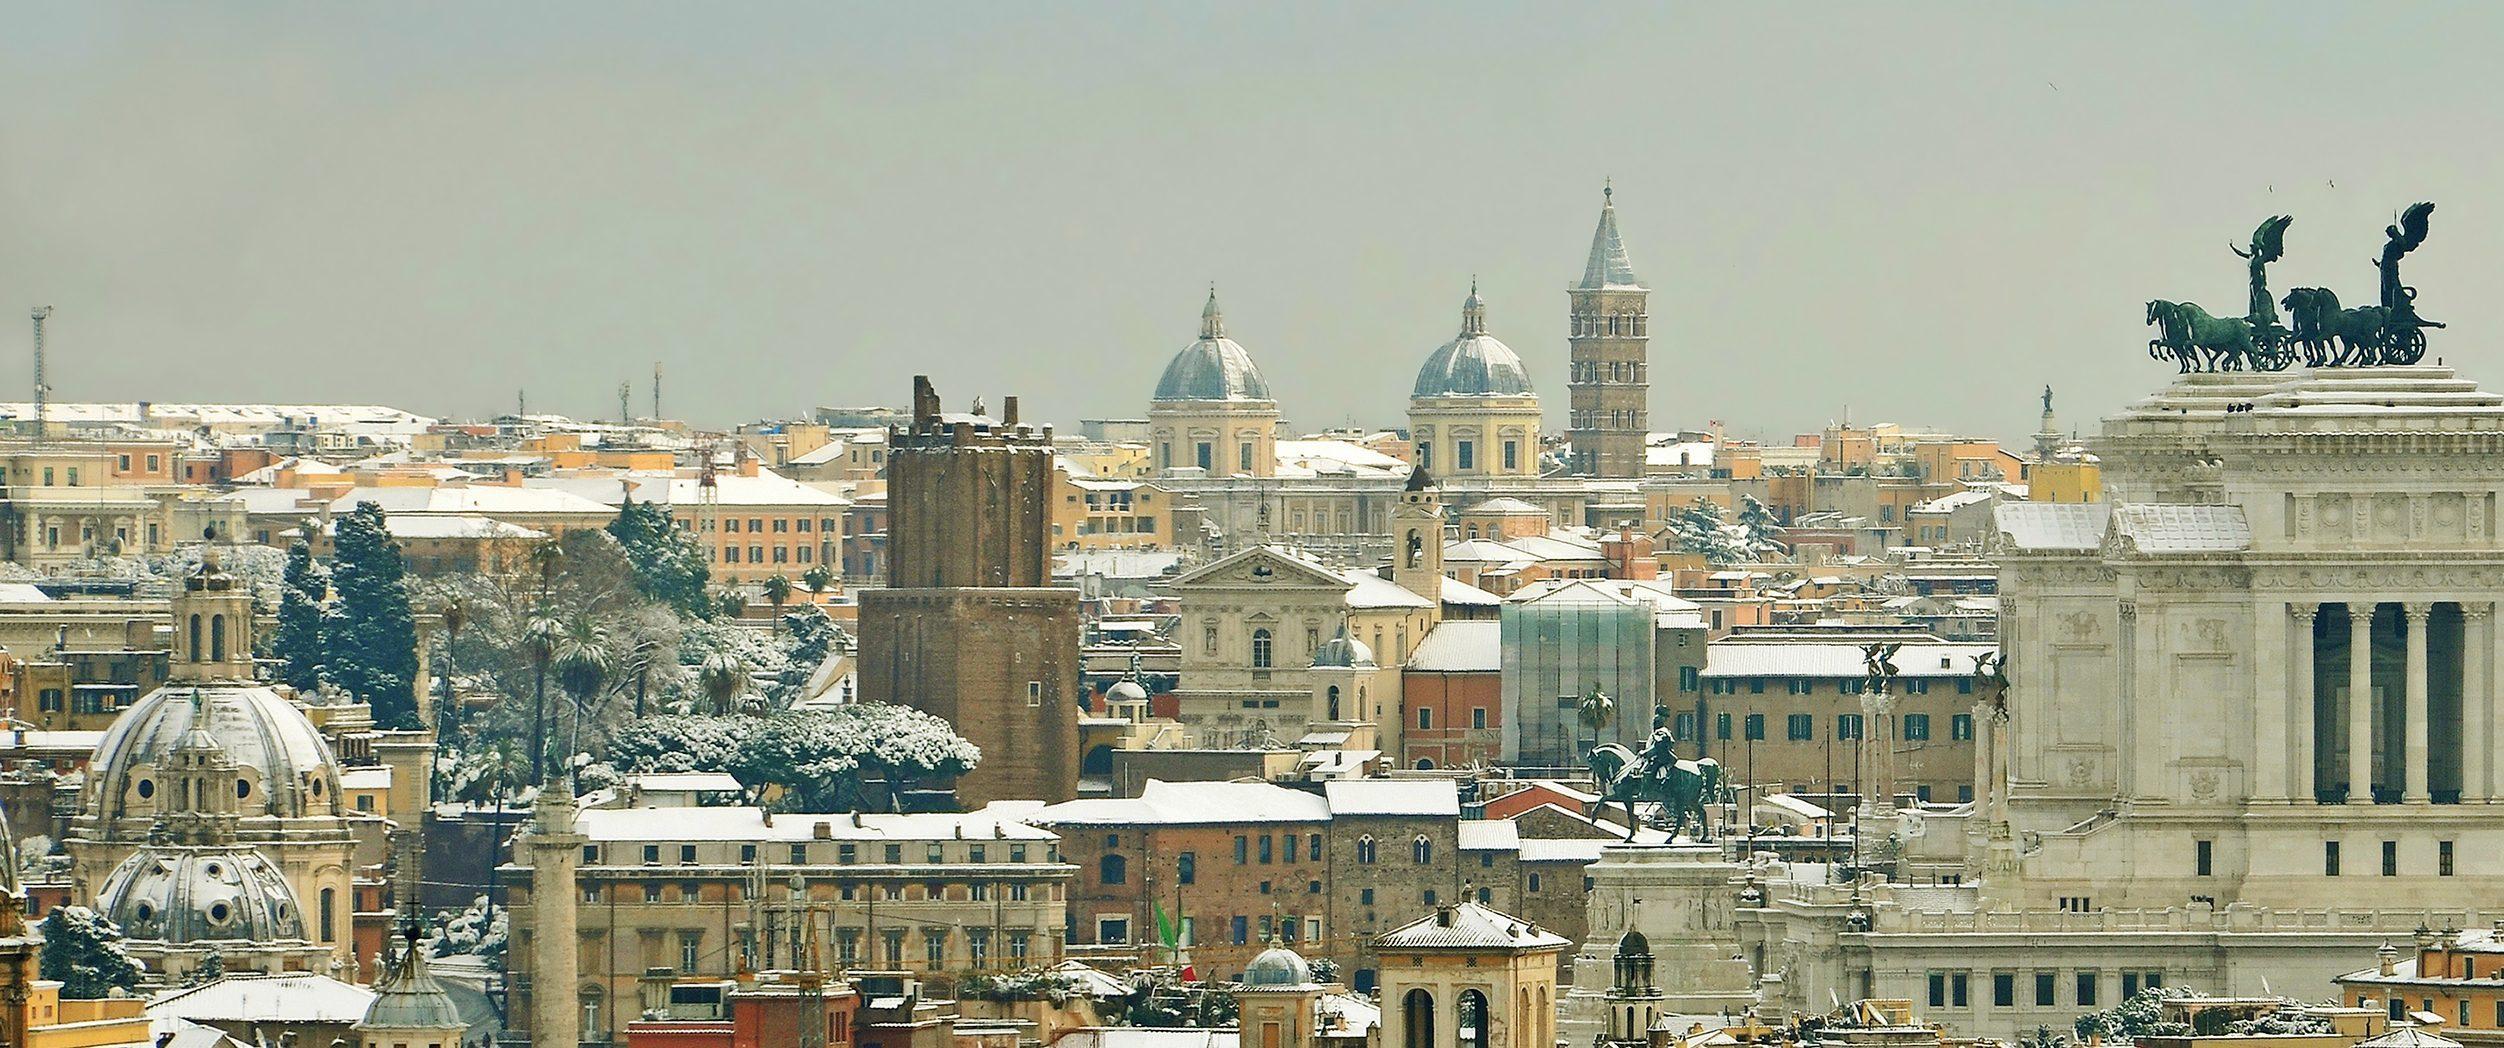 skyline of rome under snow - Image